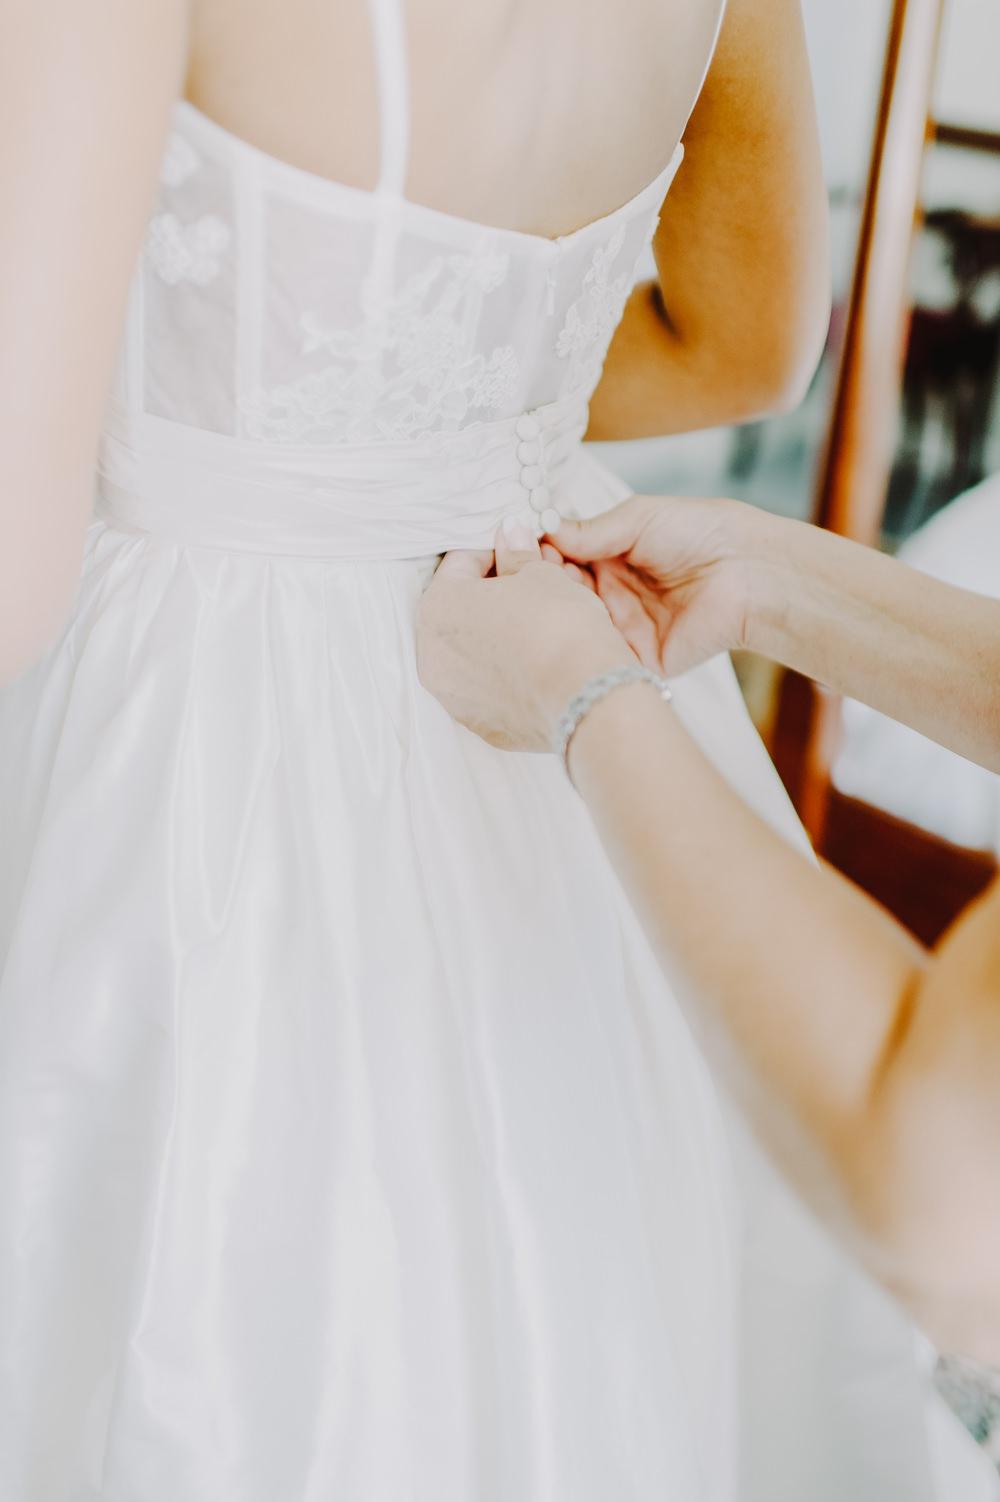 Dress Gown Bride Bridal Princess Straps Back Maryland Wedding L. Hewitt Photography